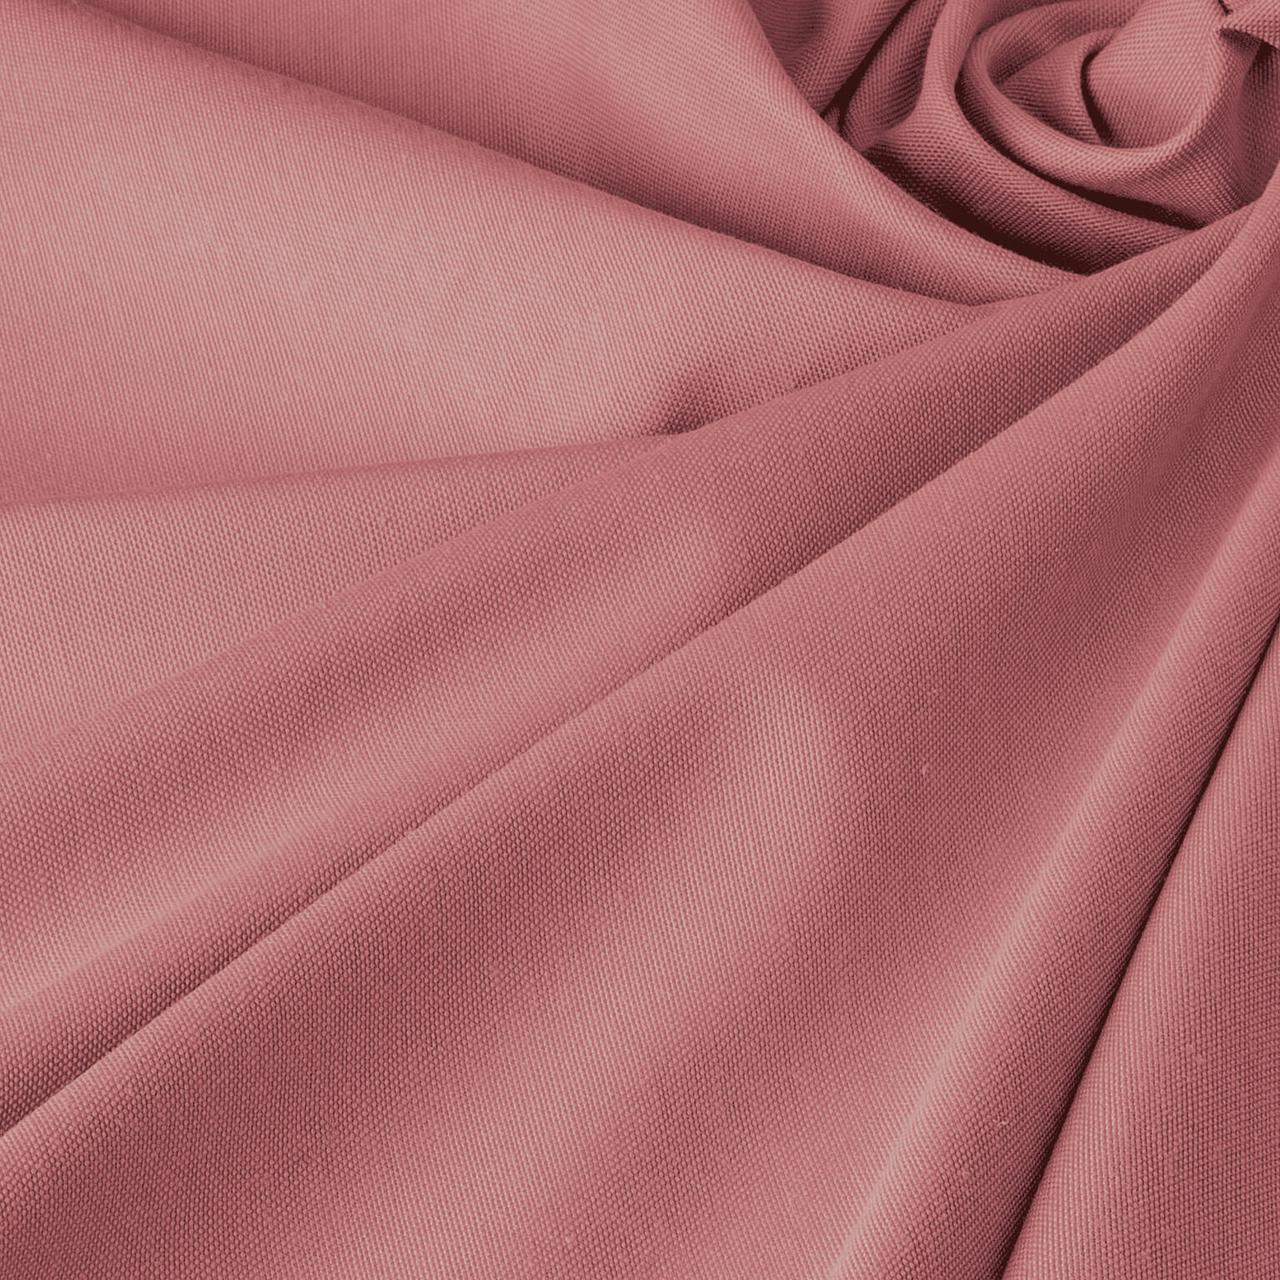 Ткань для штор и скатертей Teflon 81012